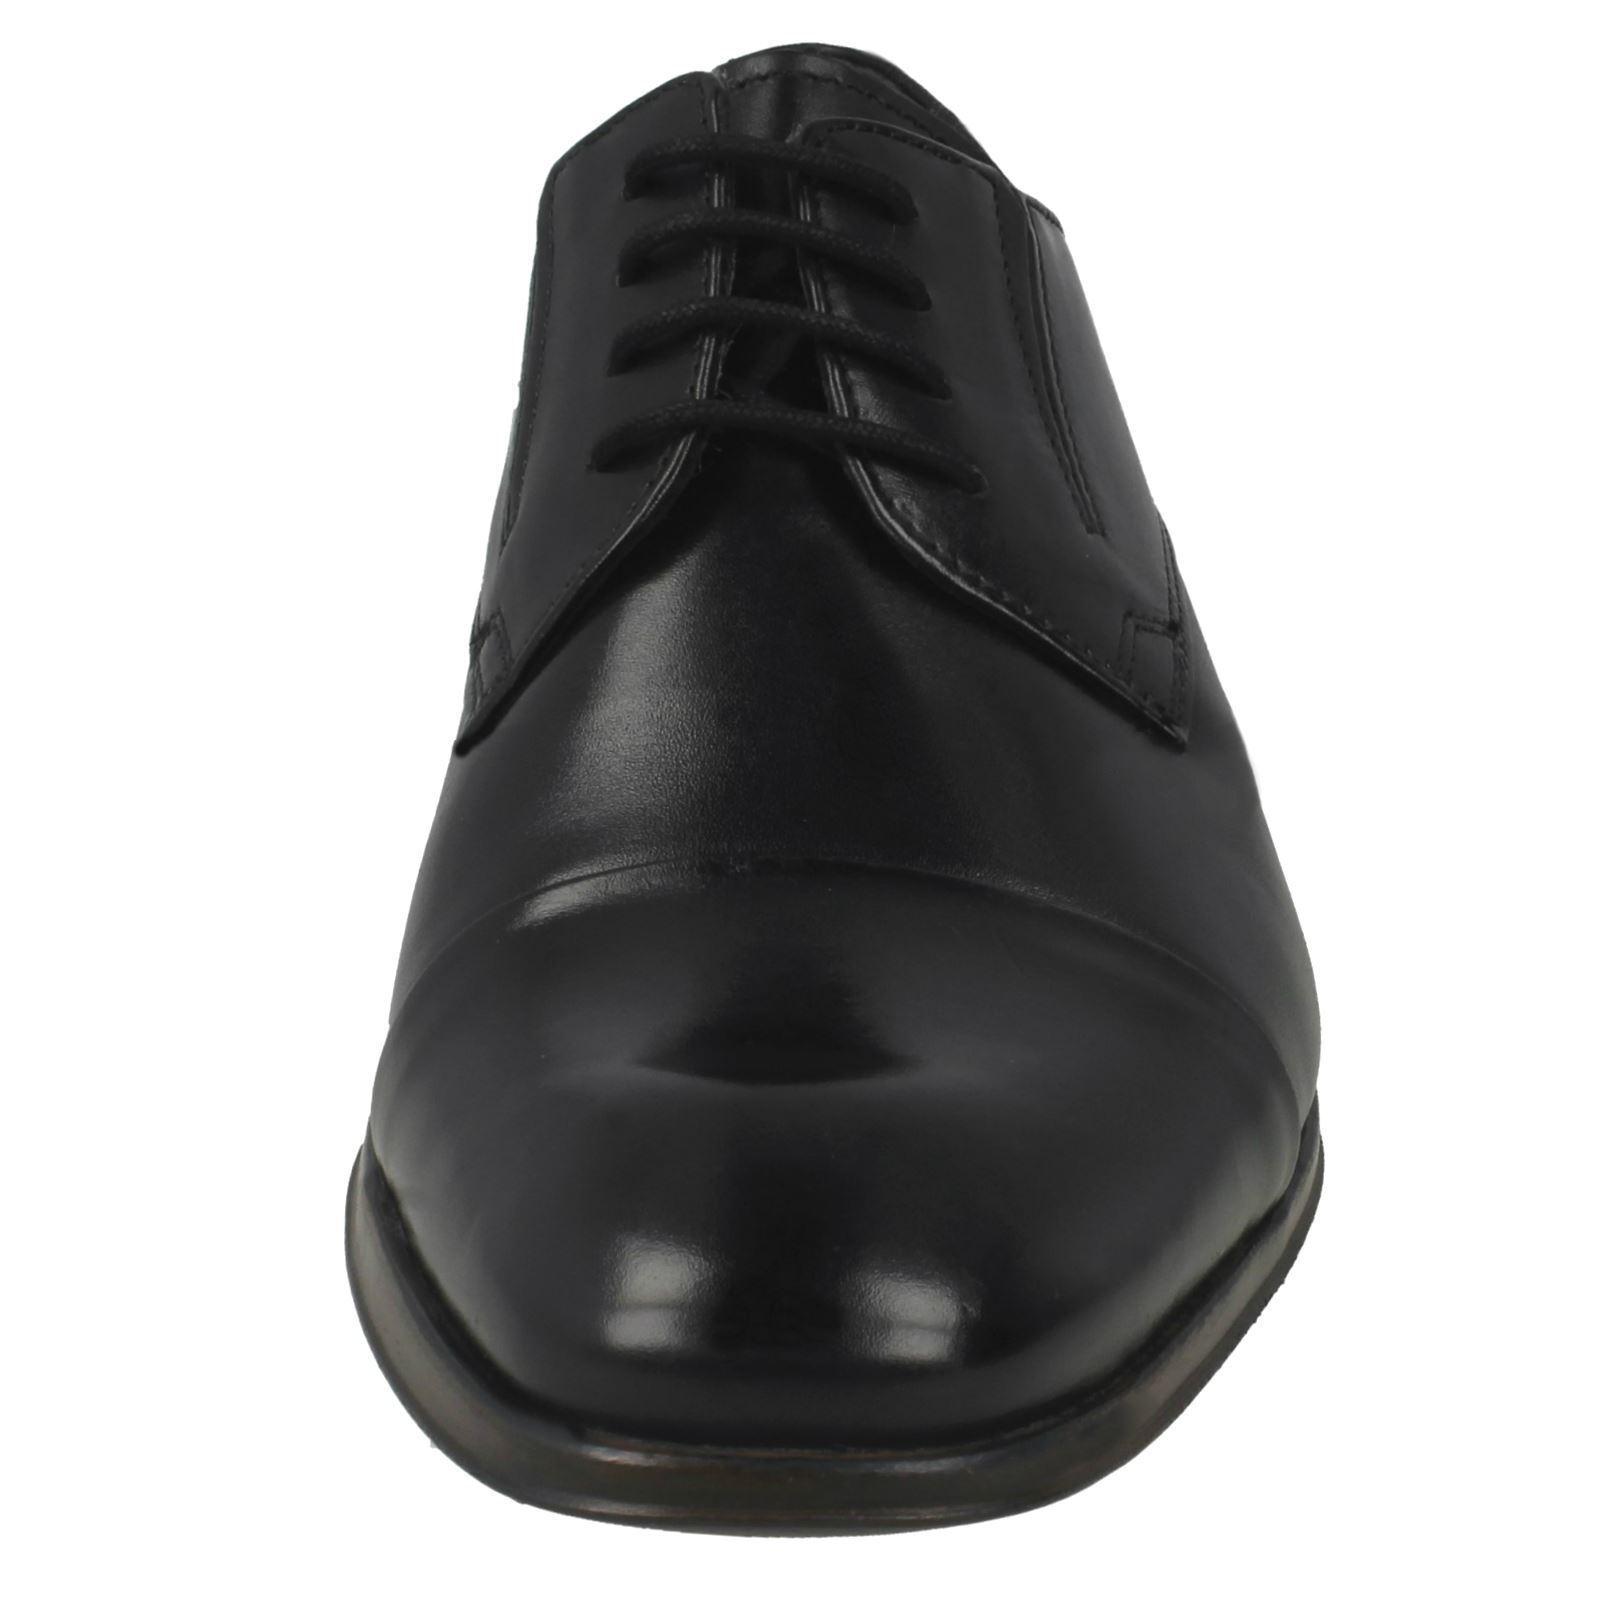 Herren Bugatti Bugatti Bugatti schwarz Leder Schnürschuhe Förmlich 312-40201 b1e291